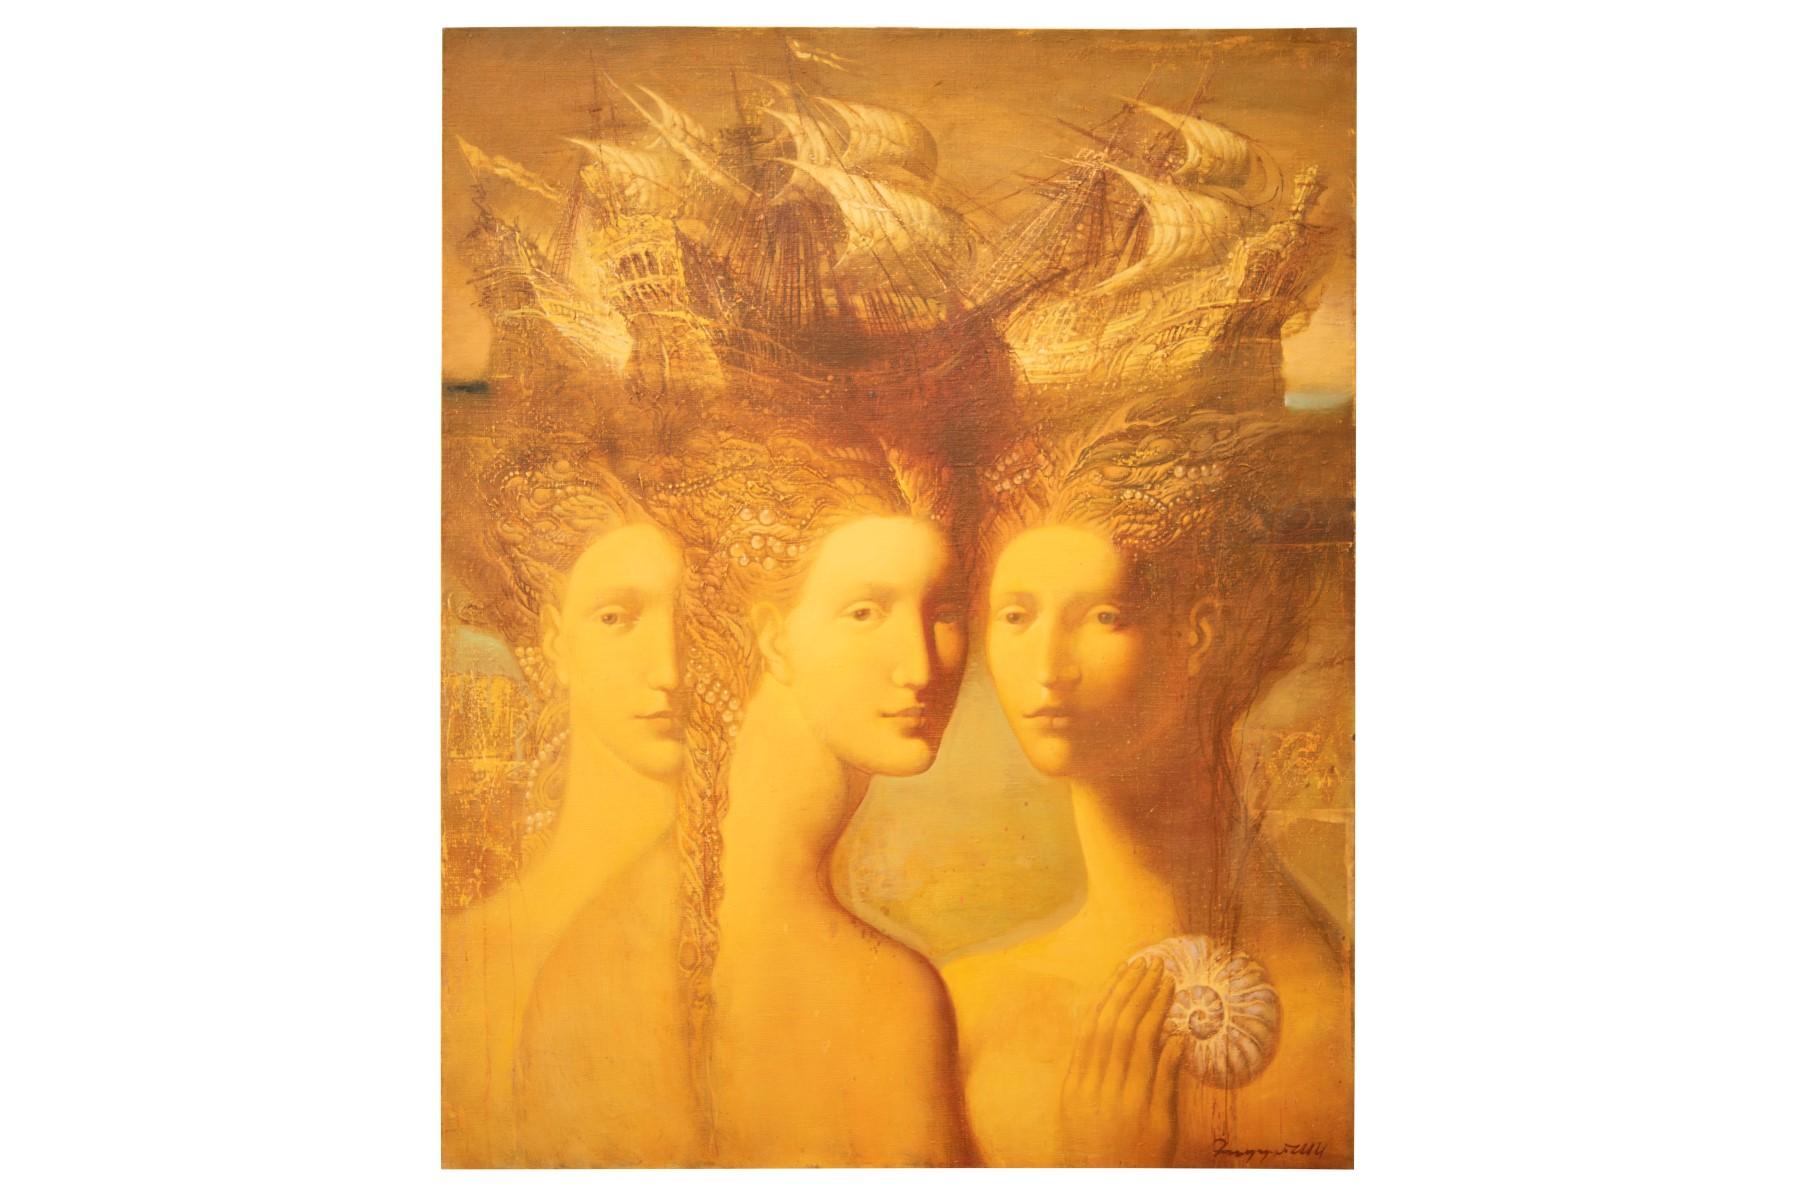 #145 Armen Gasparyan (1966), Dreaming of Journey   Armen Gasparyan (1966), Dreaming of Journey Image